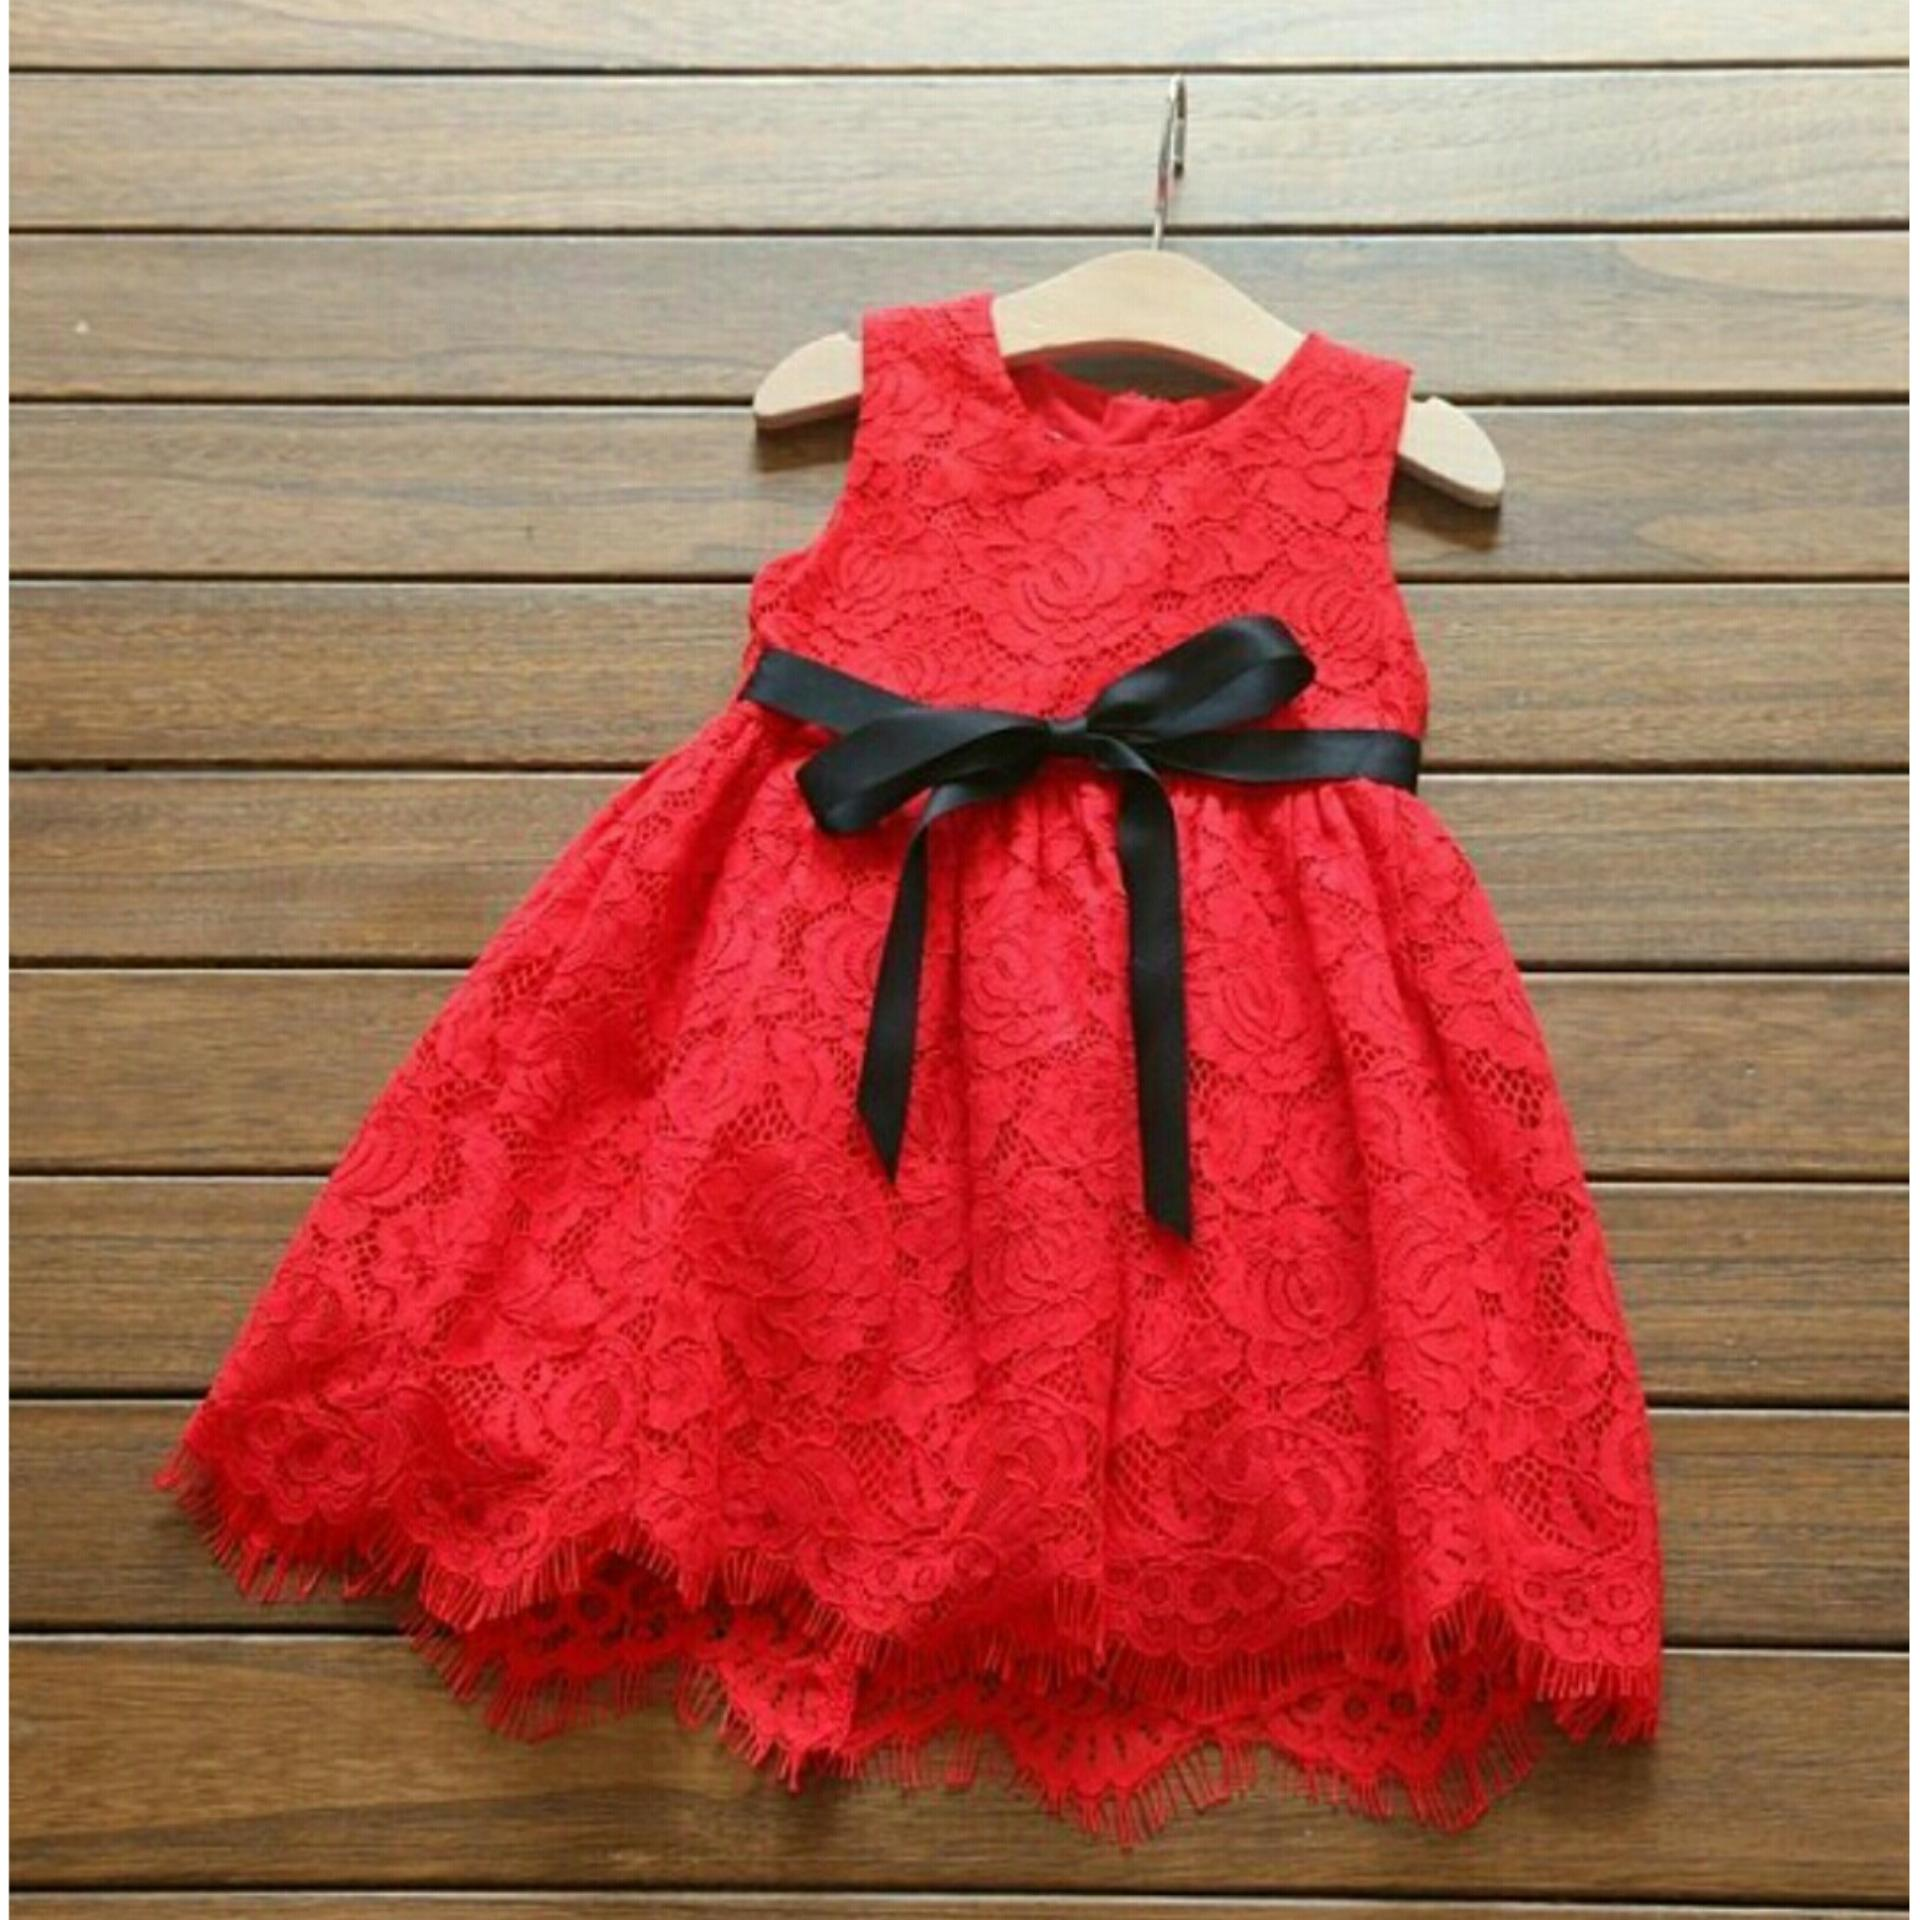 UC Baju Setelan  Anak Wanita Lucu Salur / Dress Wanita / Usia 3 - 5 Tahun / Baju Setelan  Imut NV (caca bbonri) - Putih